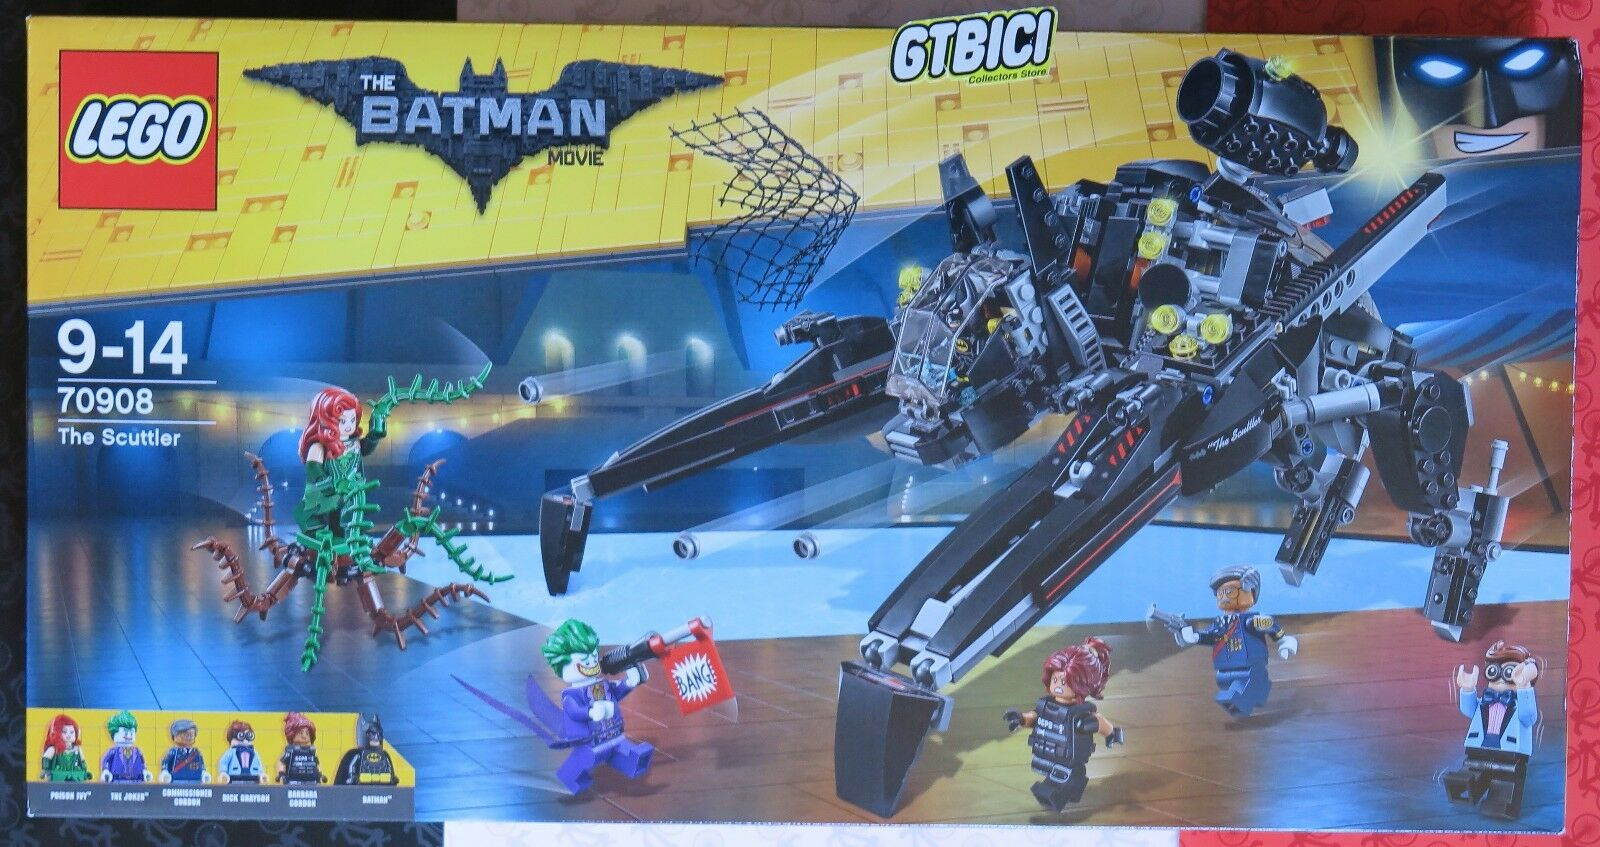 LEGO THE BATMAN MOVIE  `` `` `` THE SCUTTLER ´´  Ref 70908  NUEVO A ESTRENAR 5d12f2